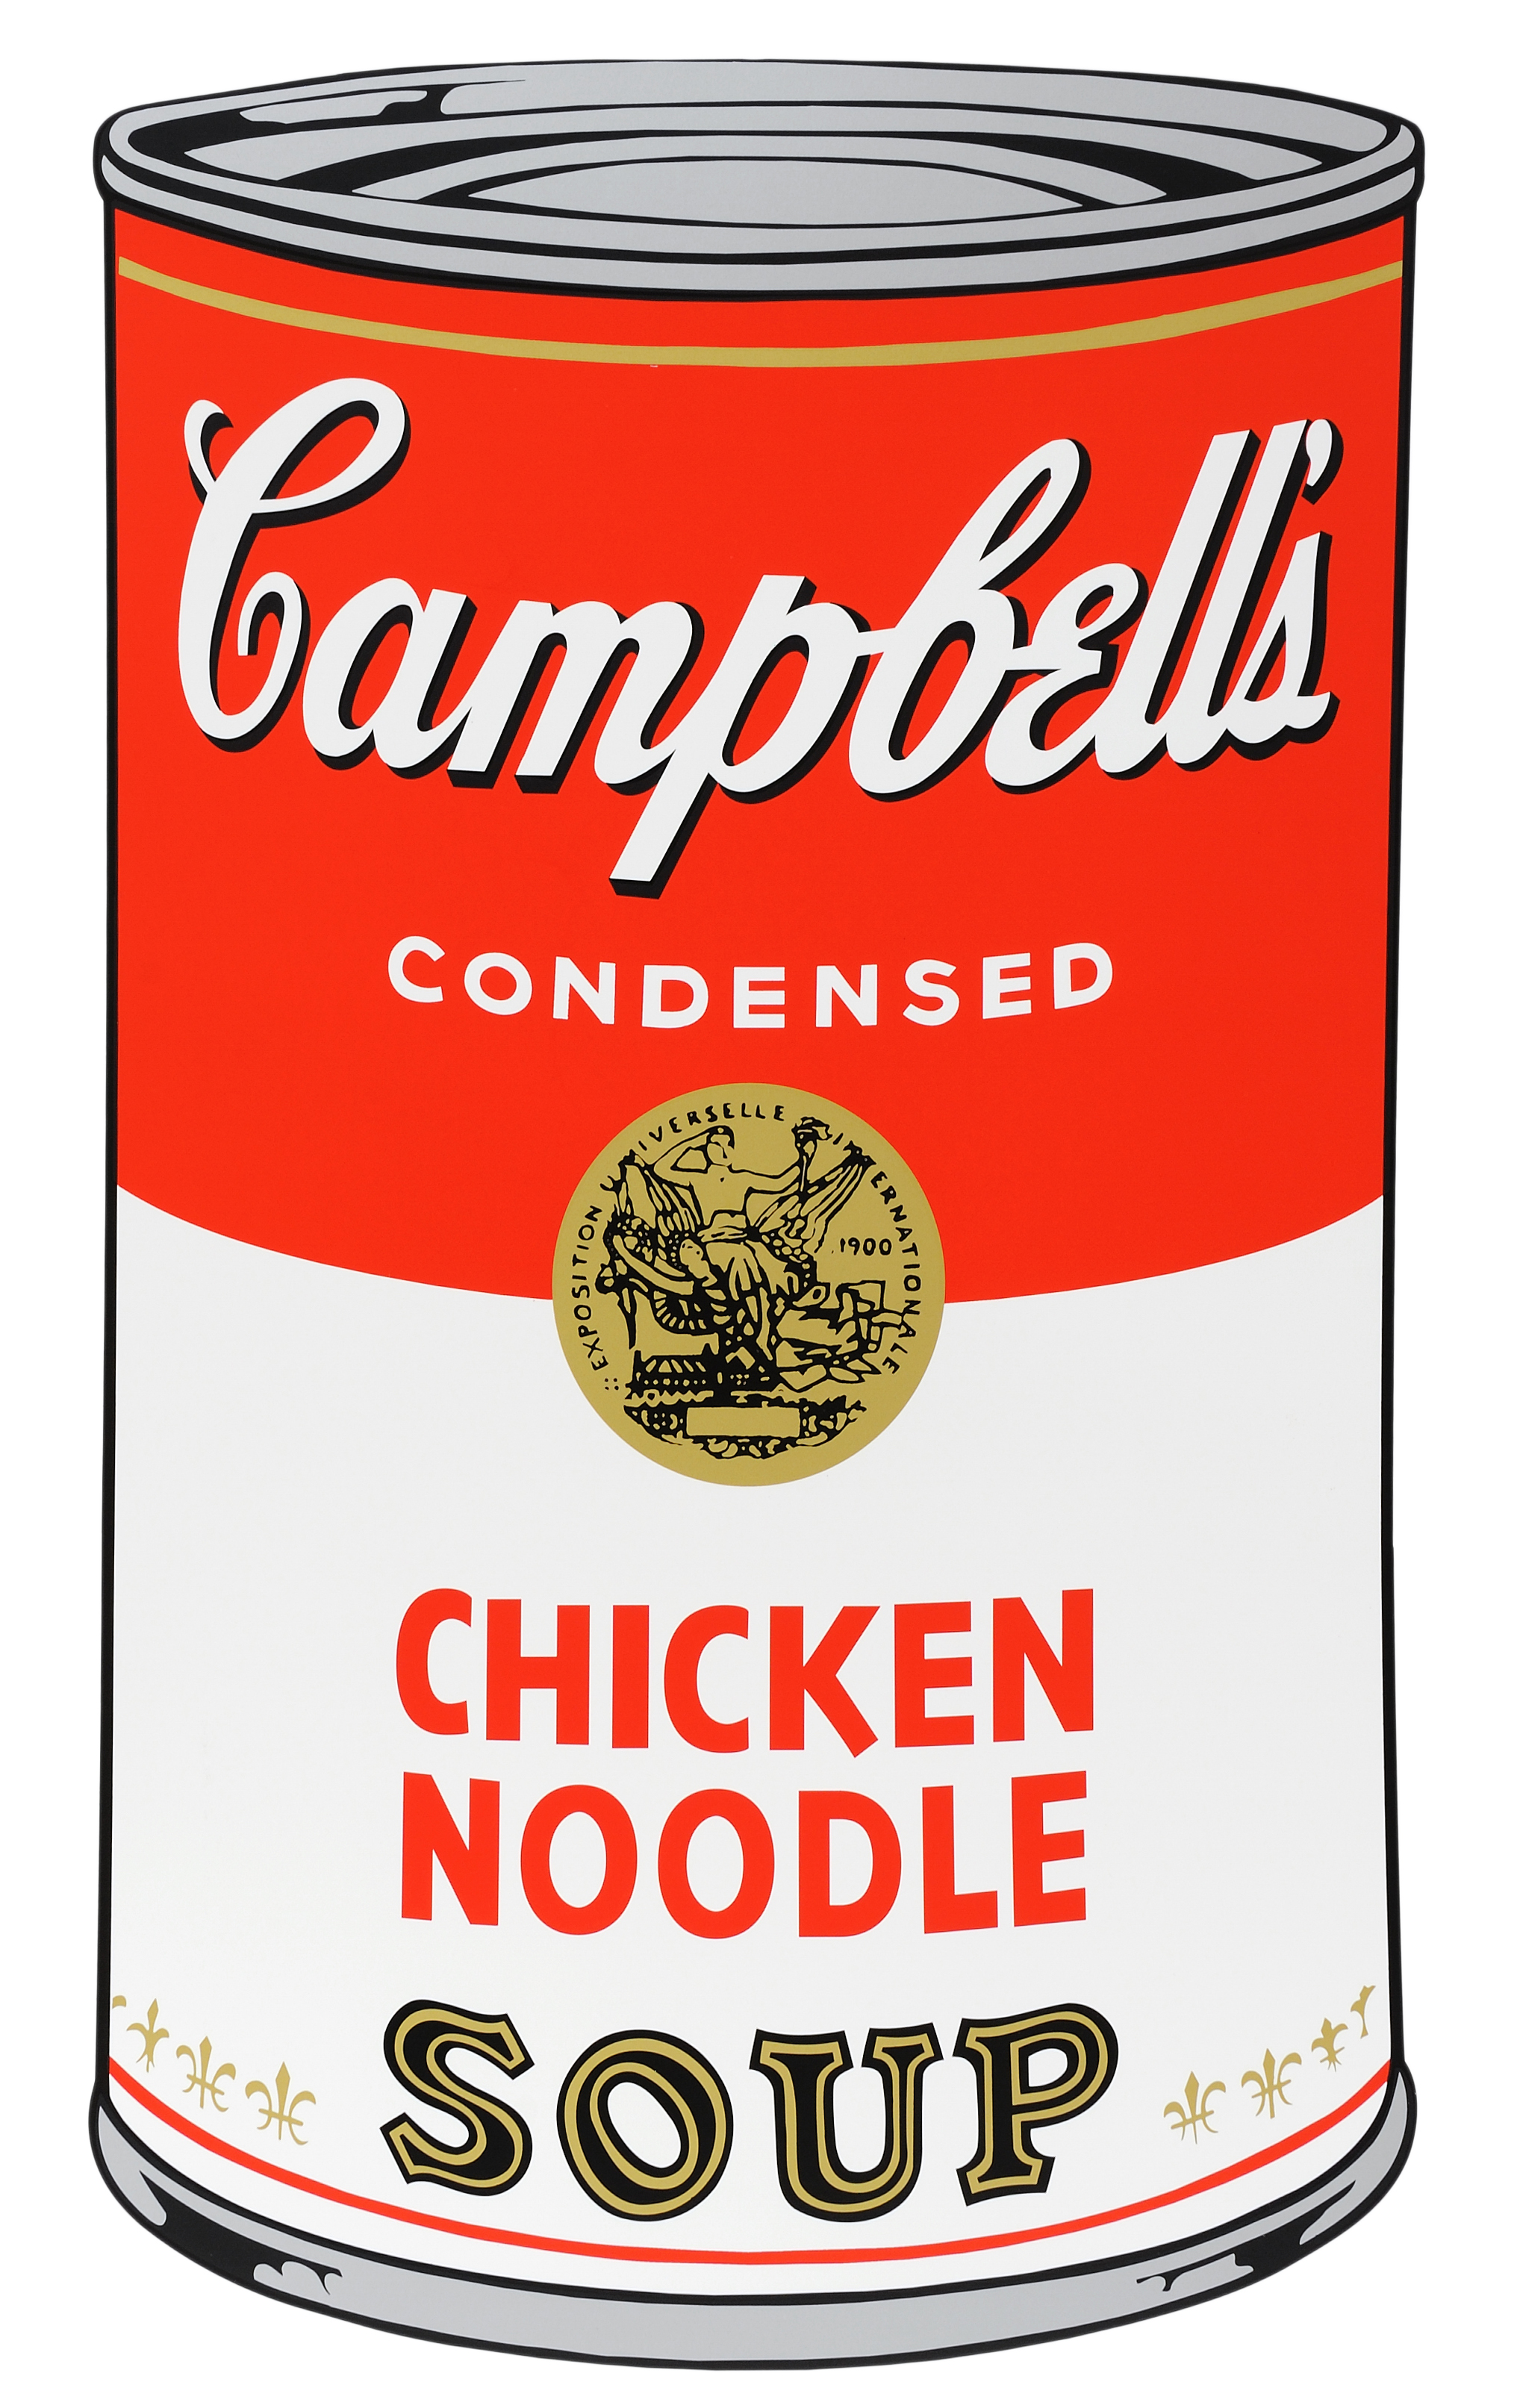 Chicken Soup clipart tomato soup Clipart Clip Panda Free Images